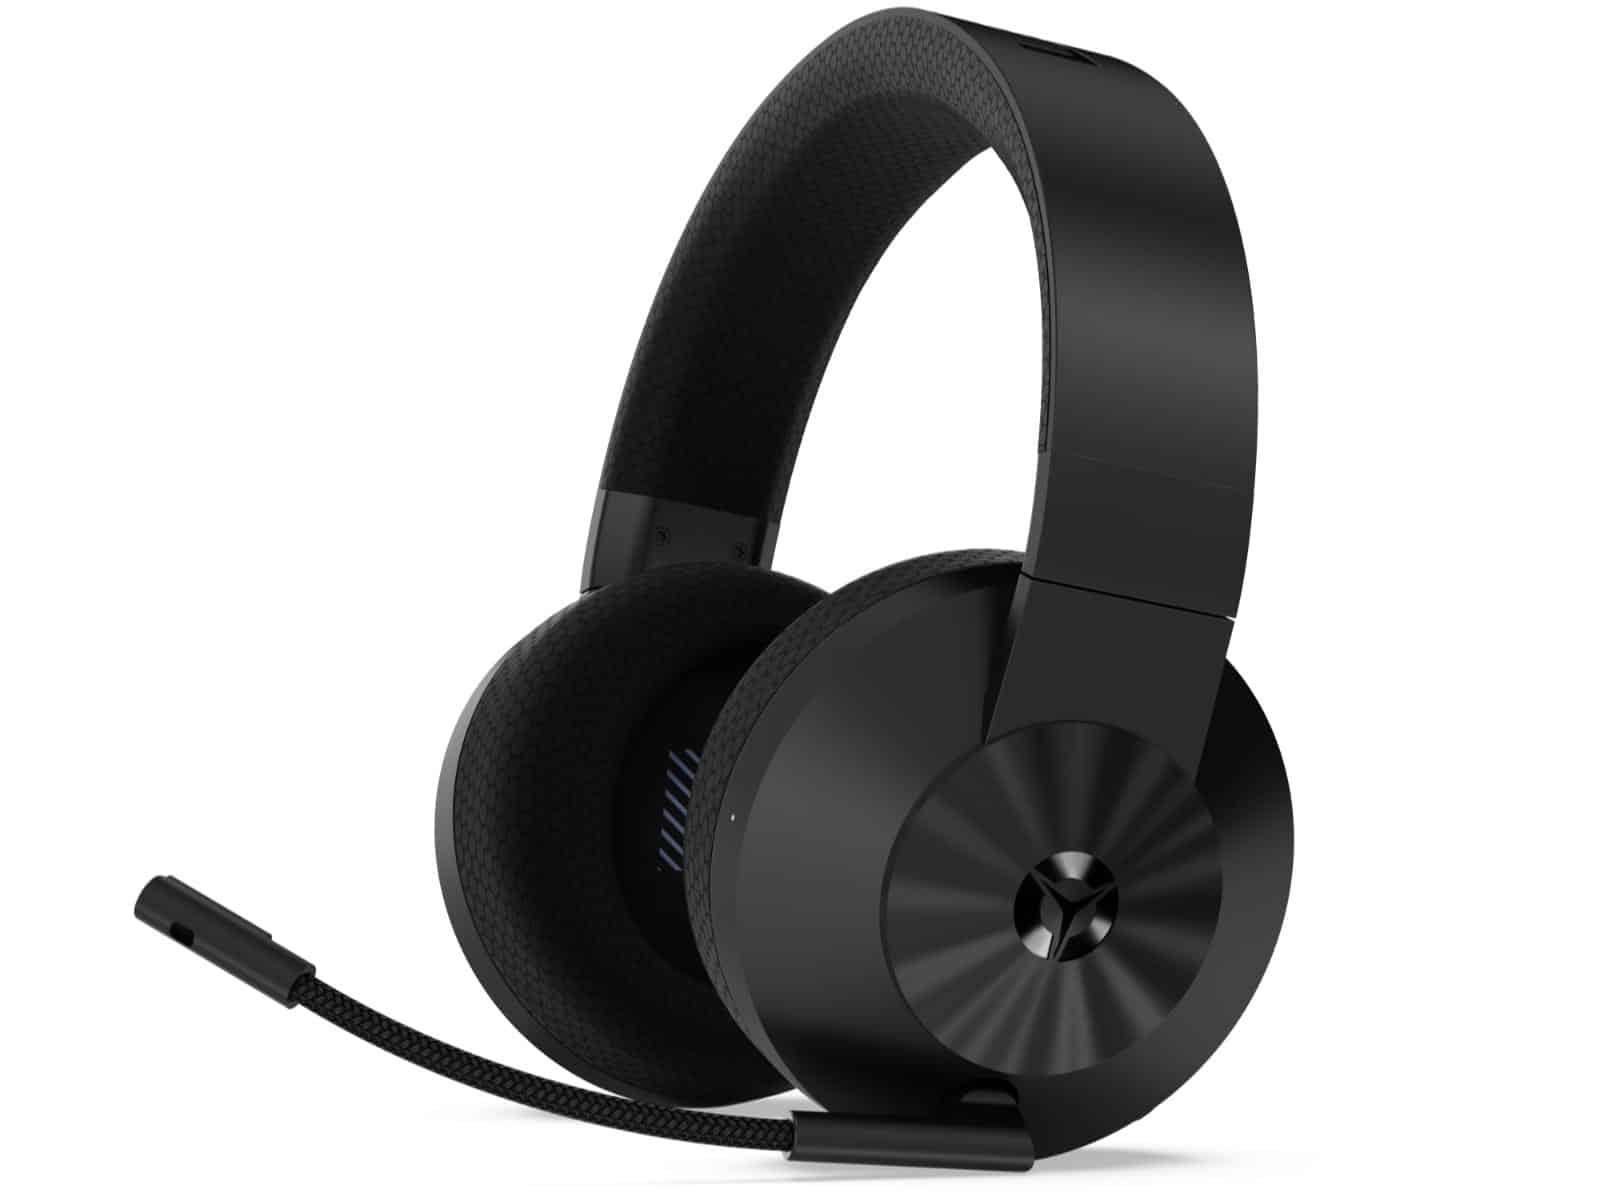 09 Lenovo Legion H600 Wireless Gaming Headset Left View